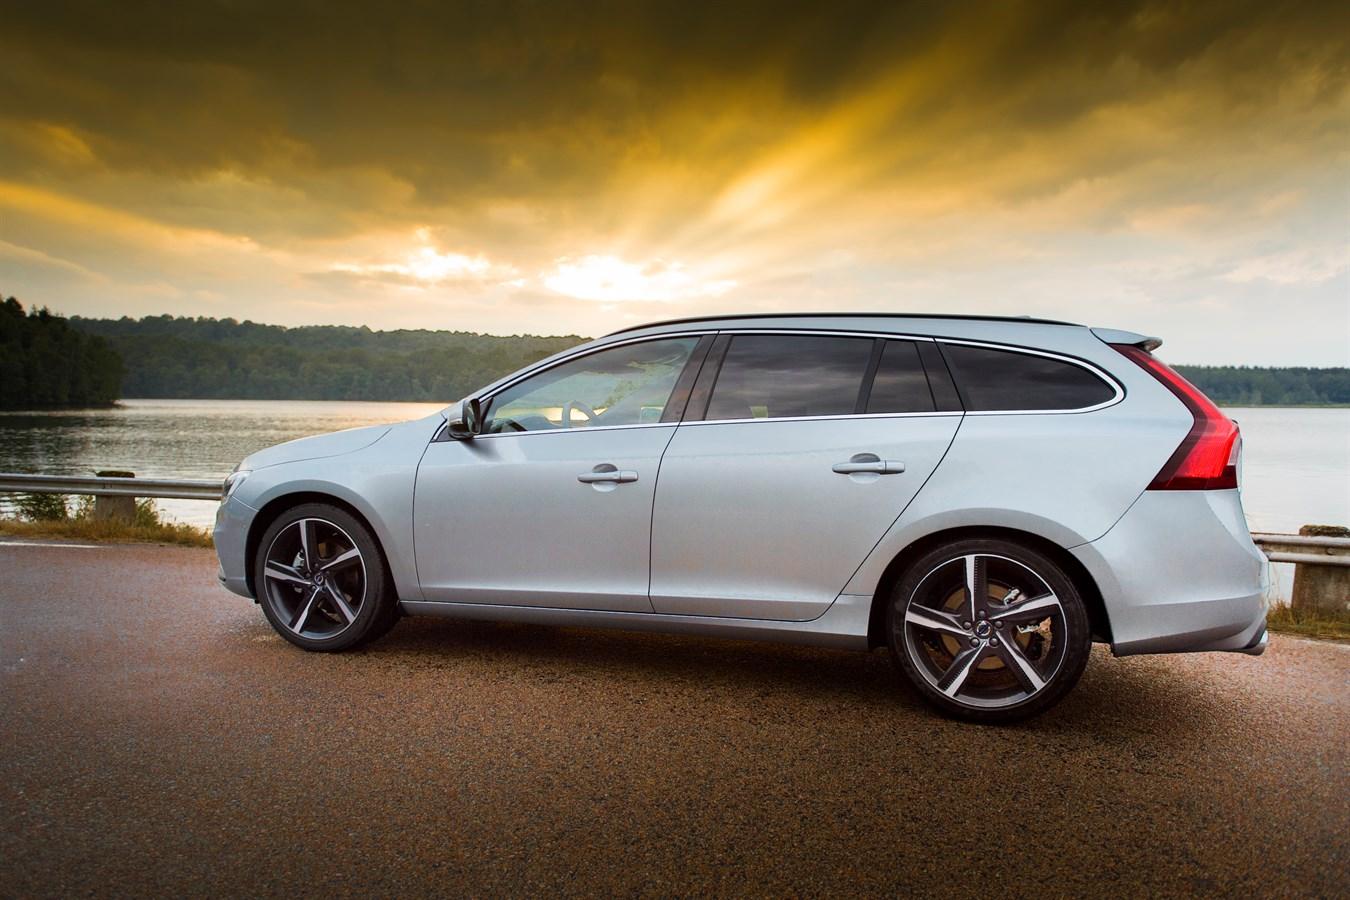 Volvo r models